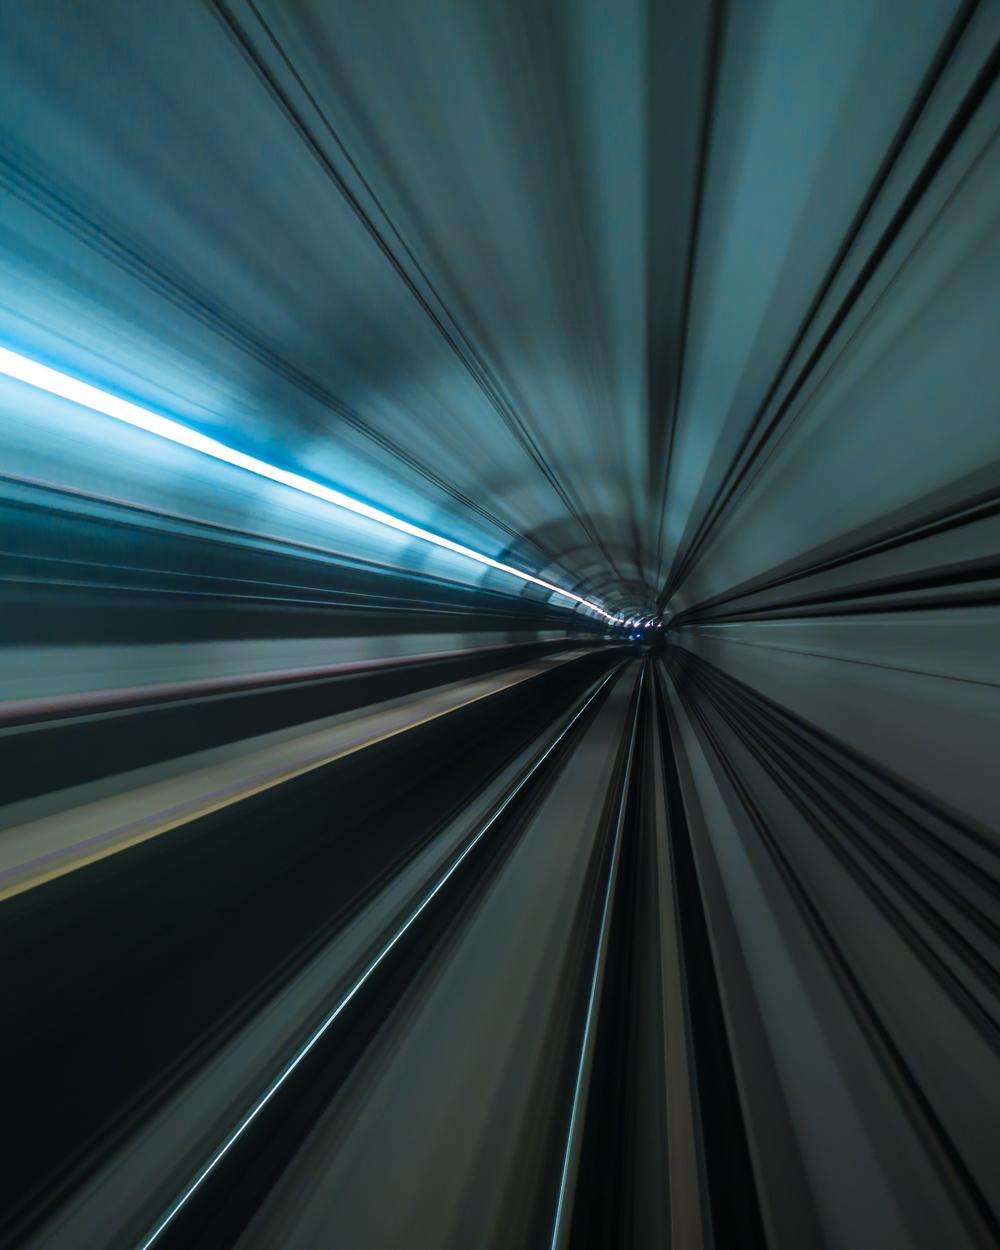 Singapore_tunnel01_E01-1.jpg